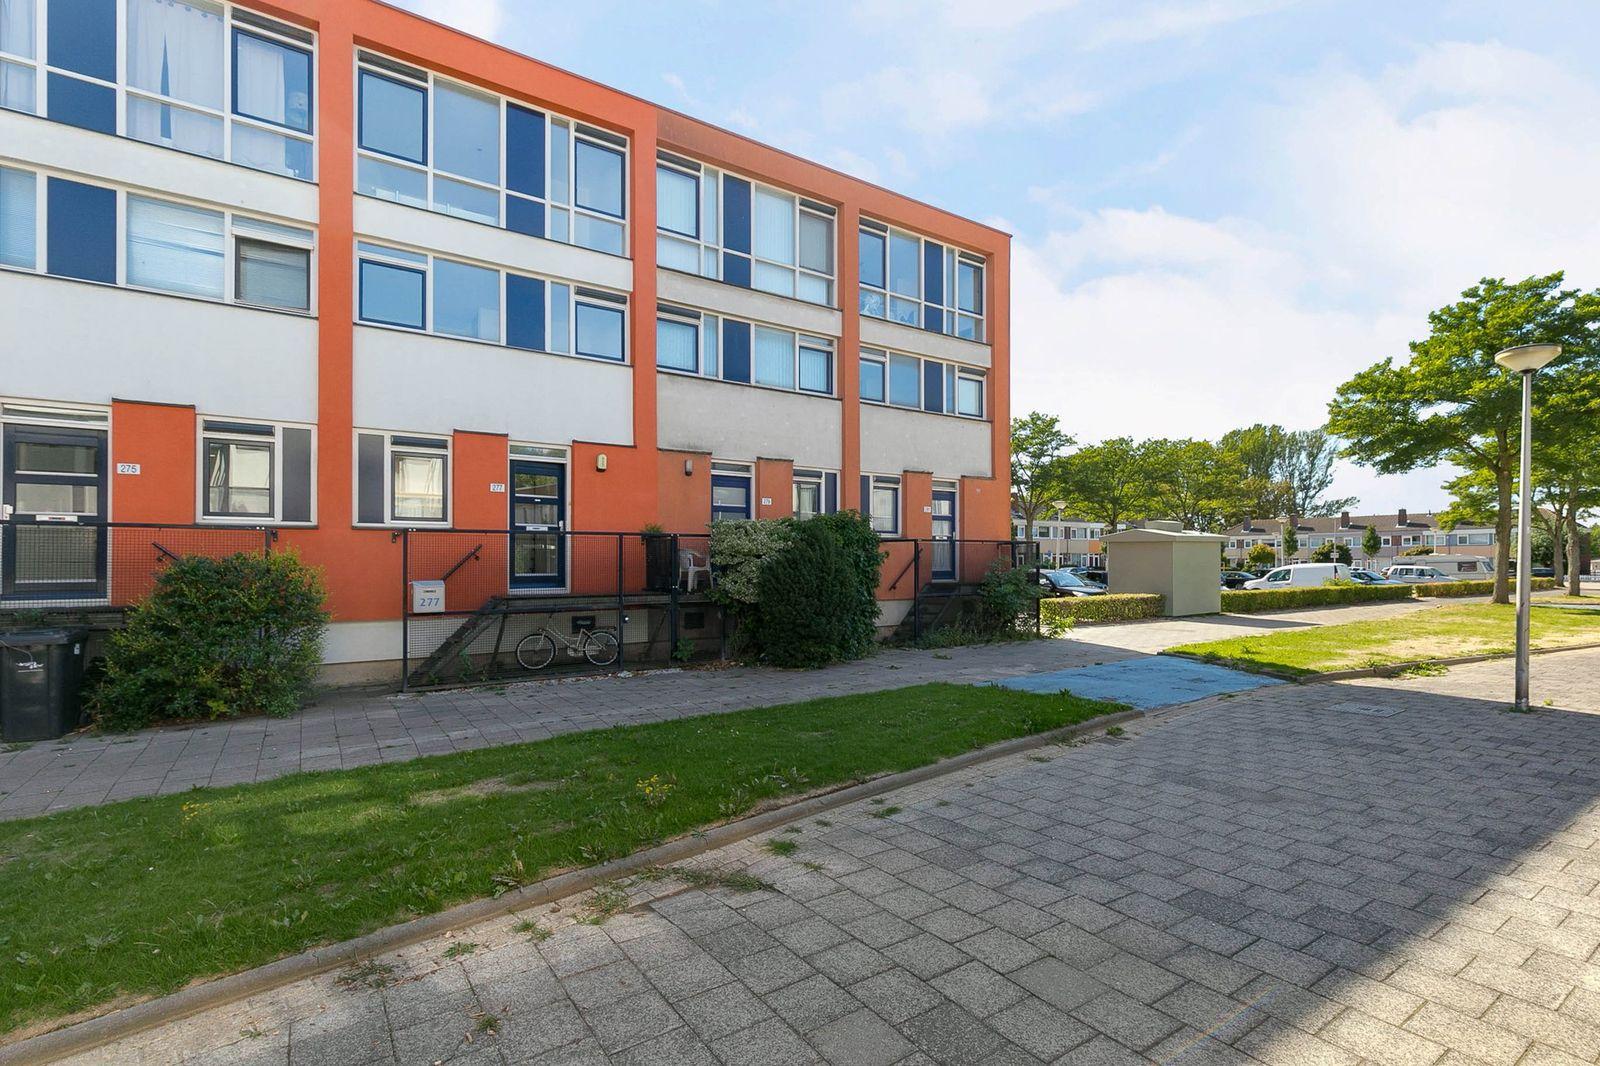 Pieter Stastokweg 277, Hoogvliet Rotterdam